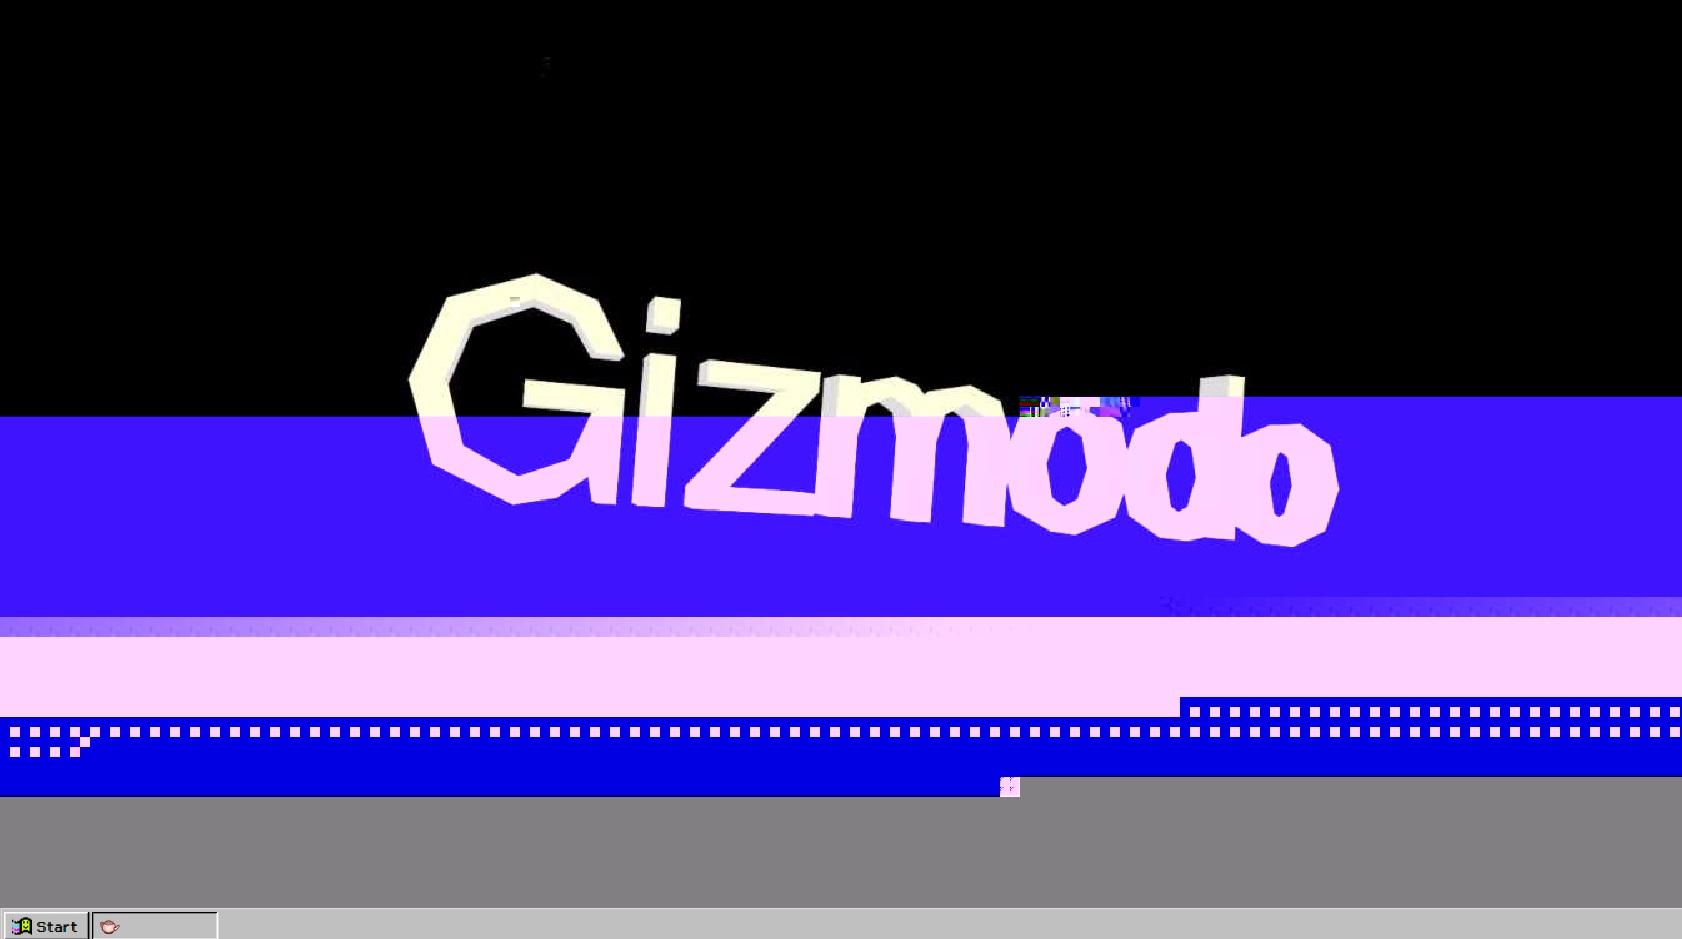 Windows 93 beta - glitch